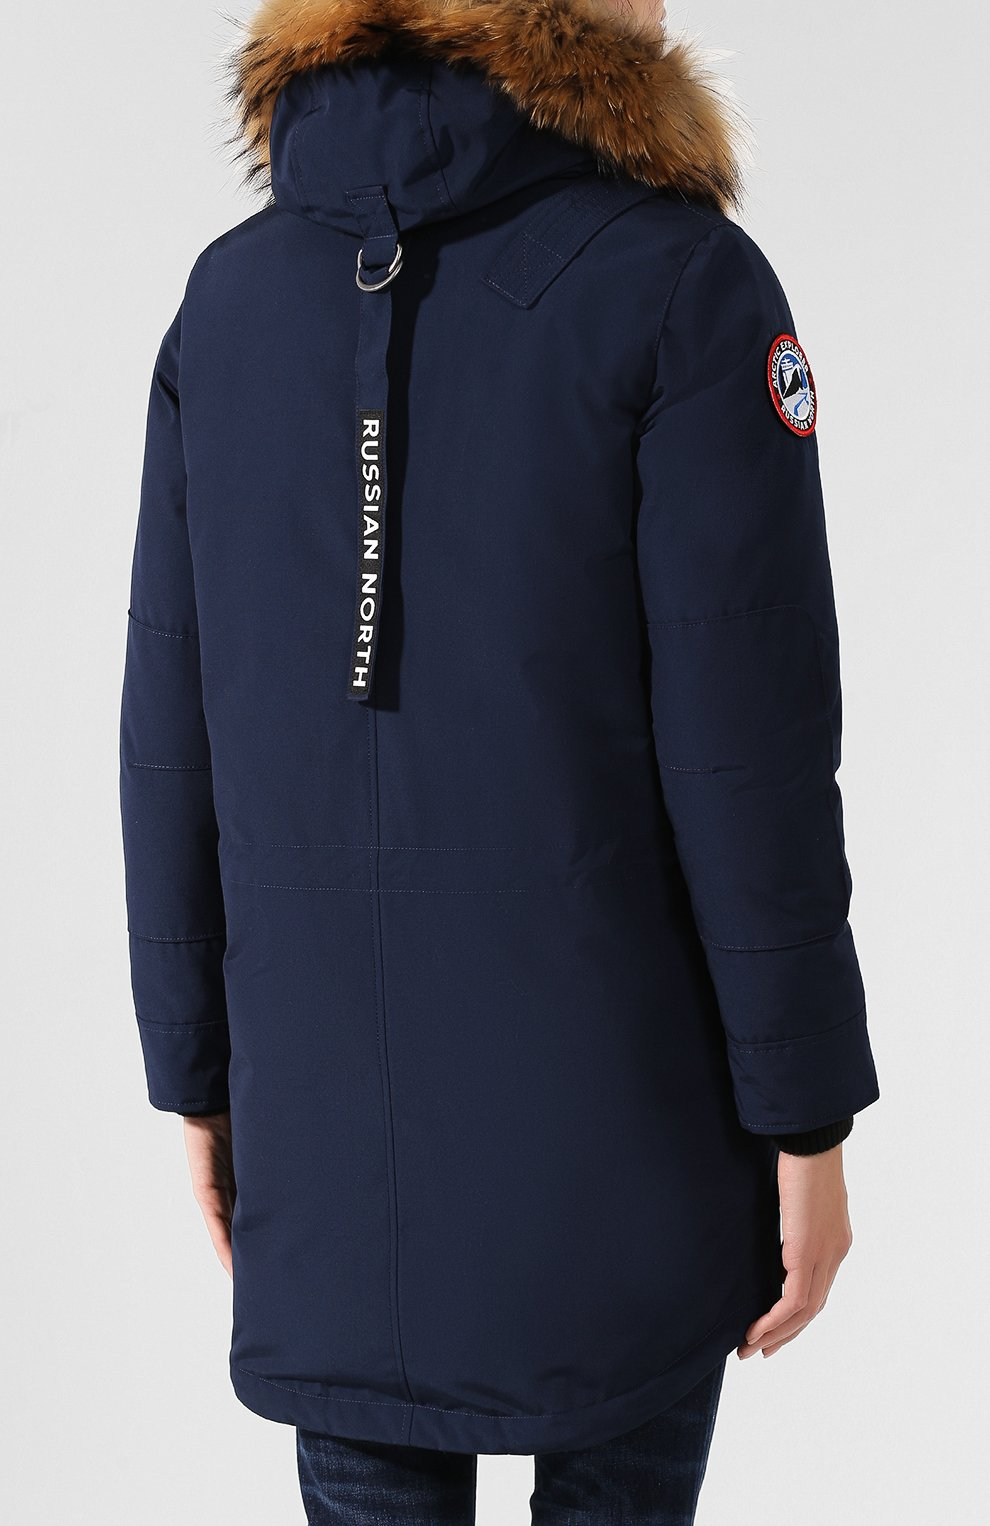 Женский пуховик chill ARCTIC EXPLORER синего цвета, арт. CHILL_NAVY_W | Фото 4